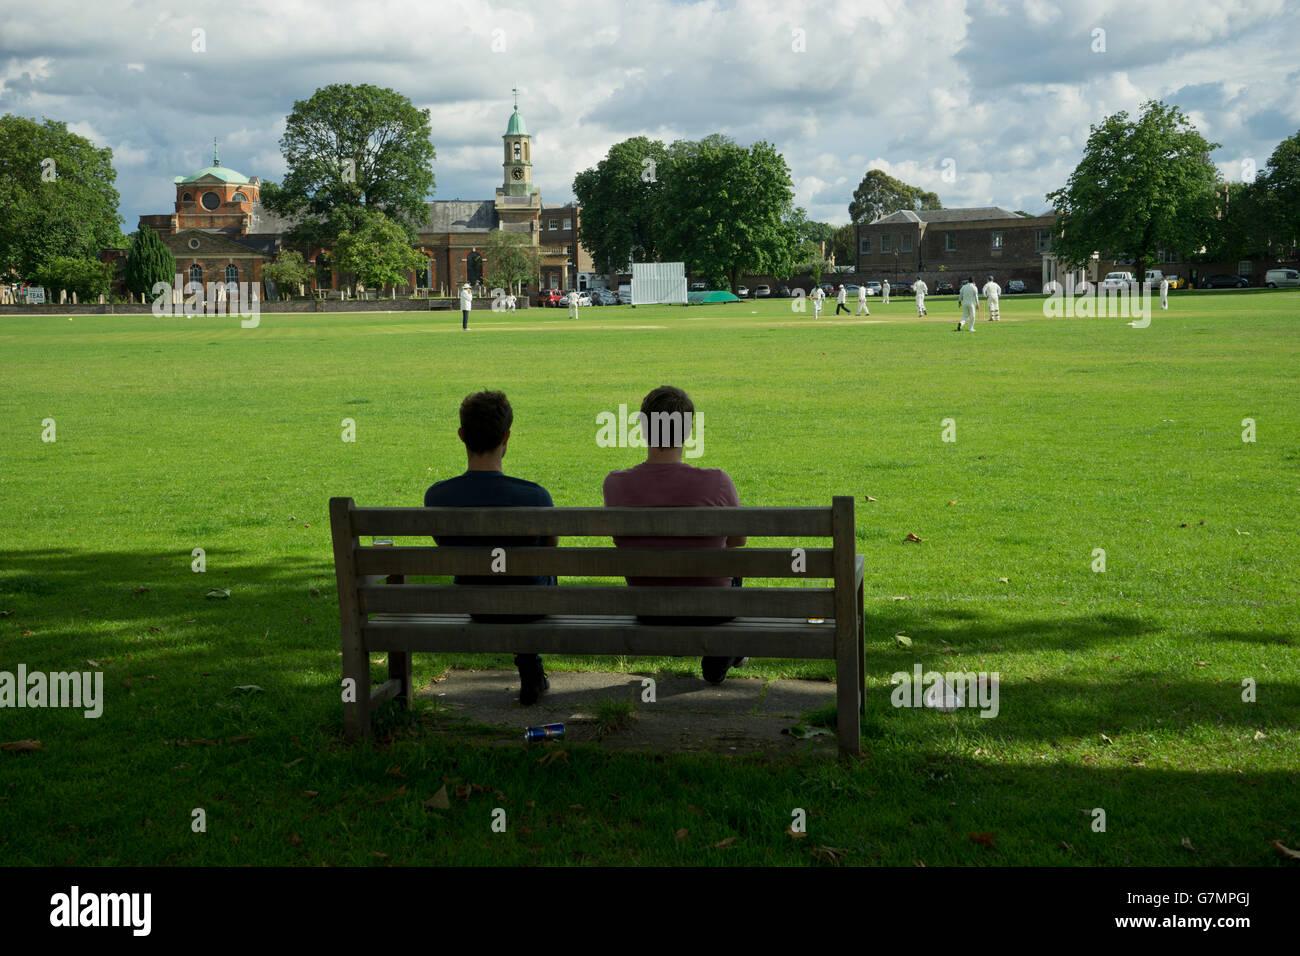 People watch cricket game in Kew Green, London, UK - Stock Image